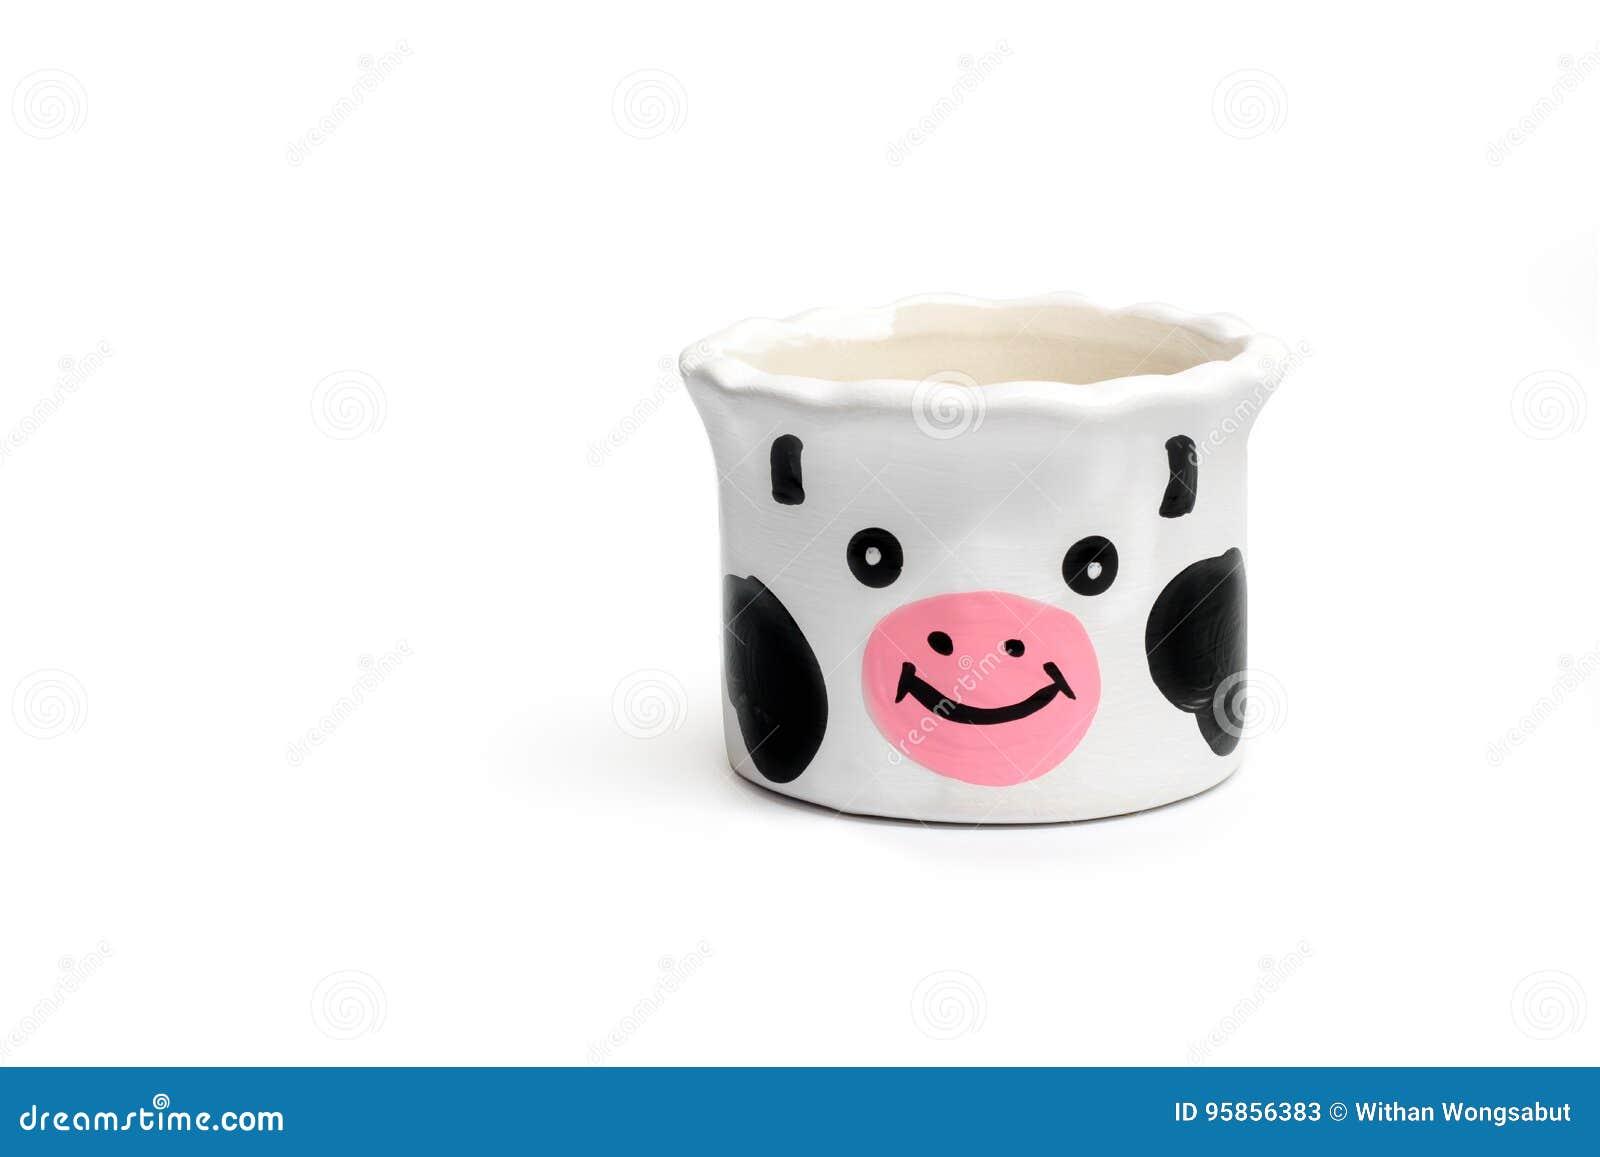 Small White Flower Pot Cow Shape Stock Image Image Of Ceramic